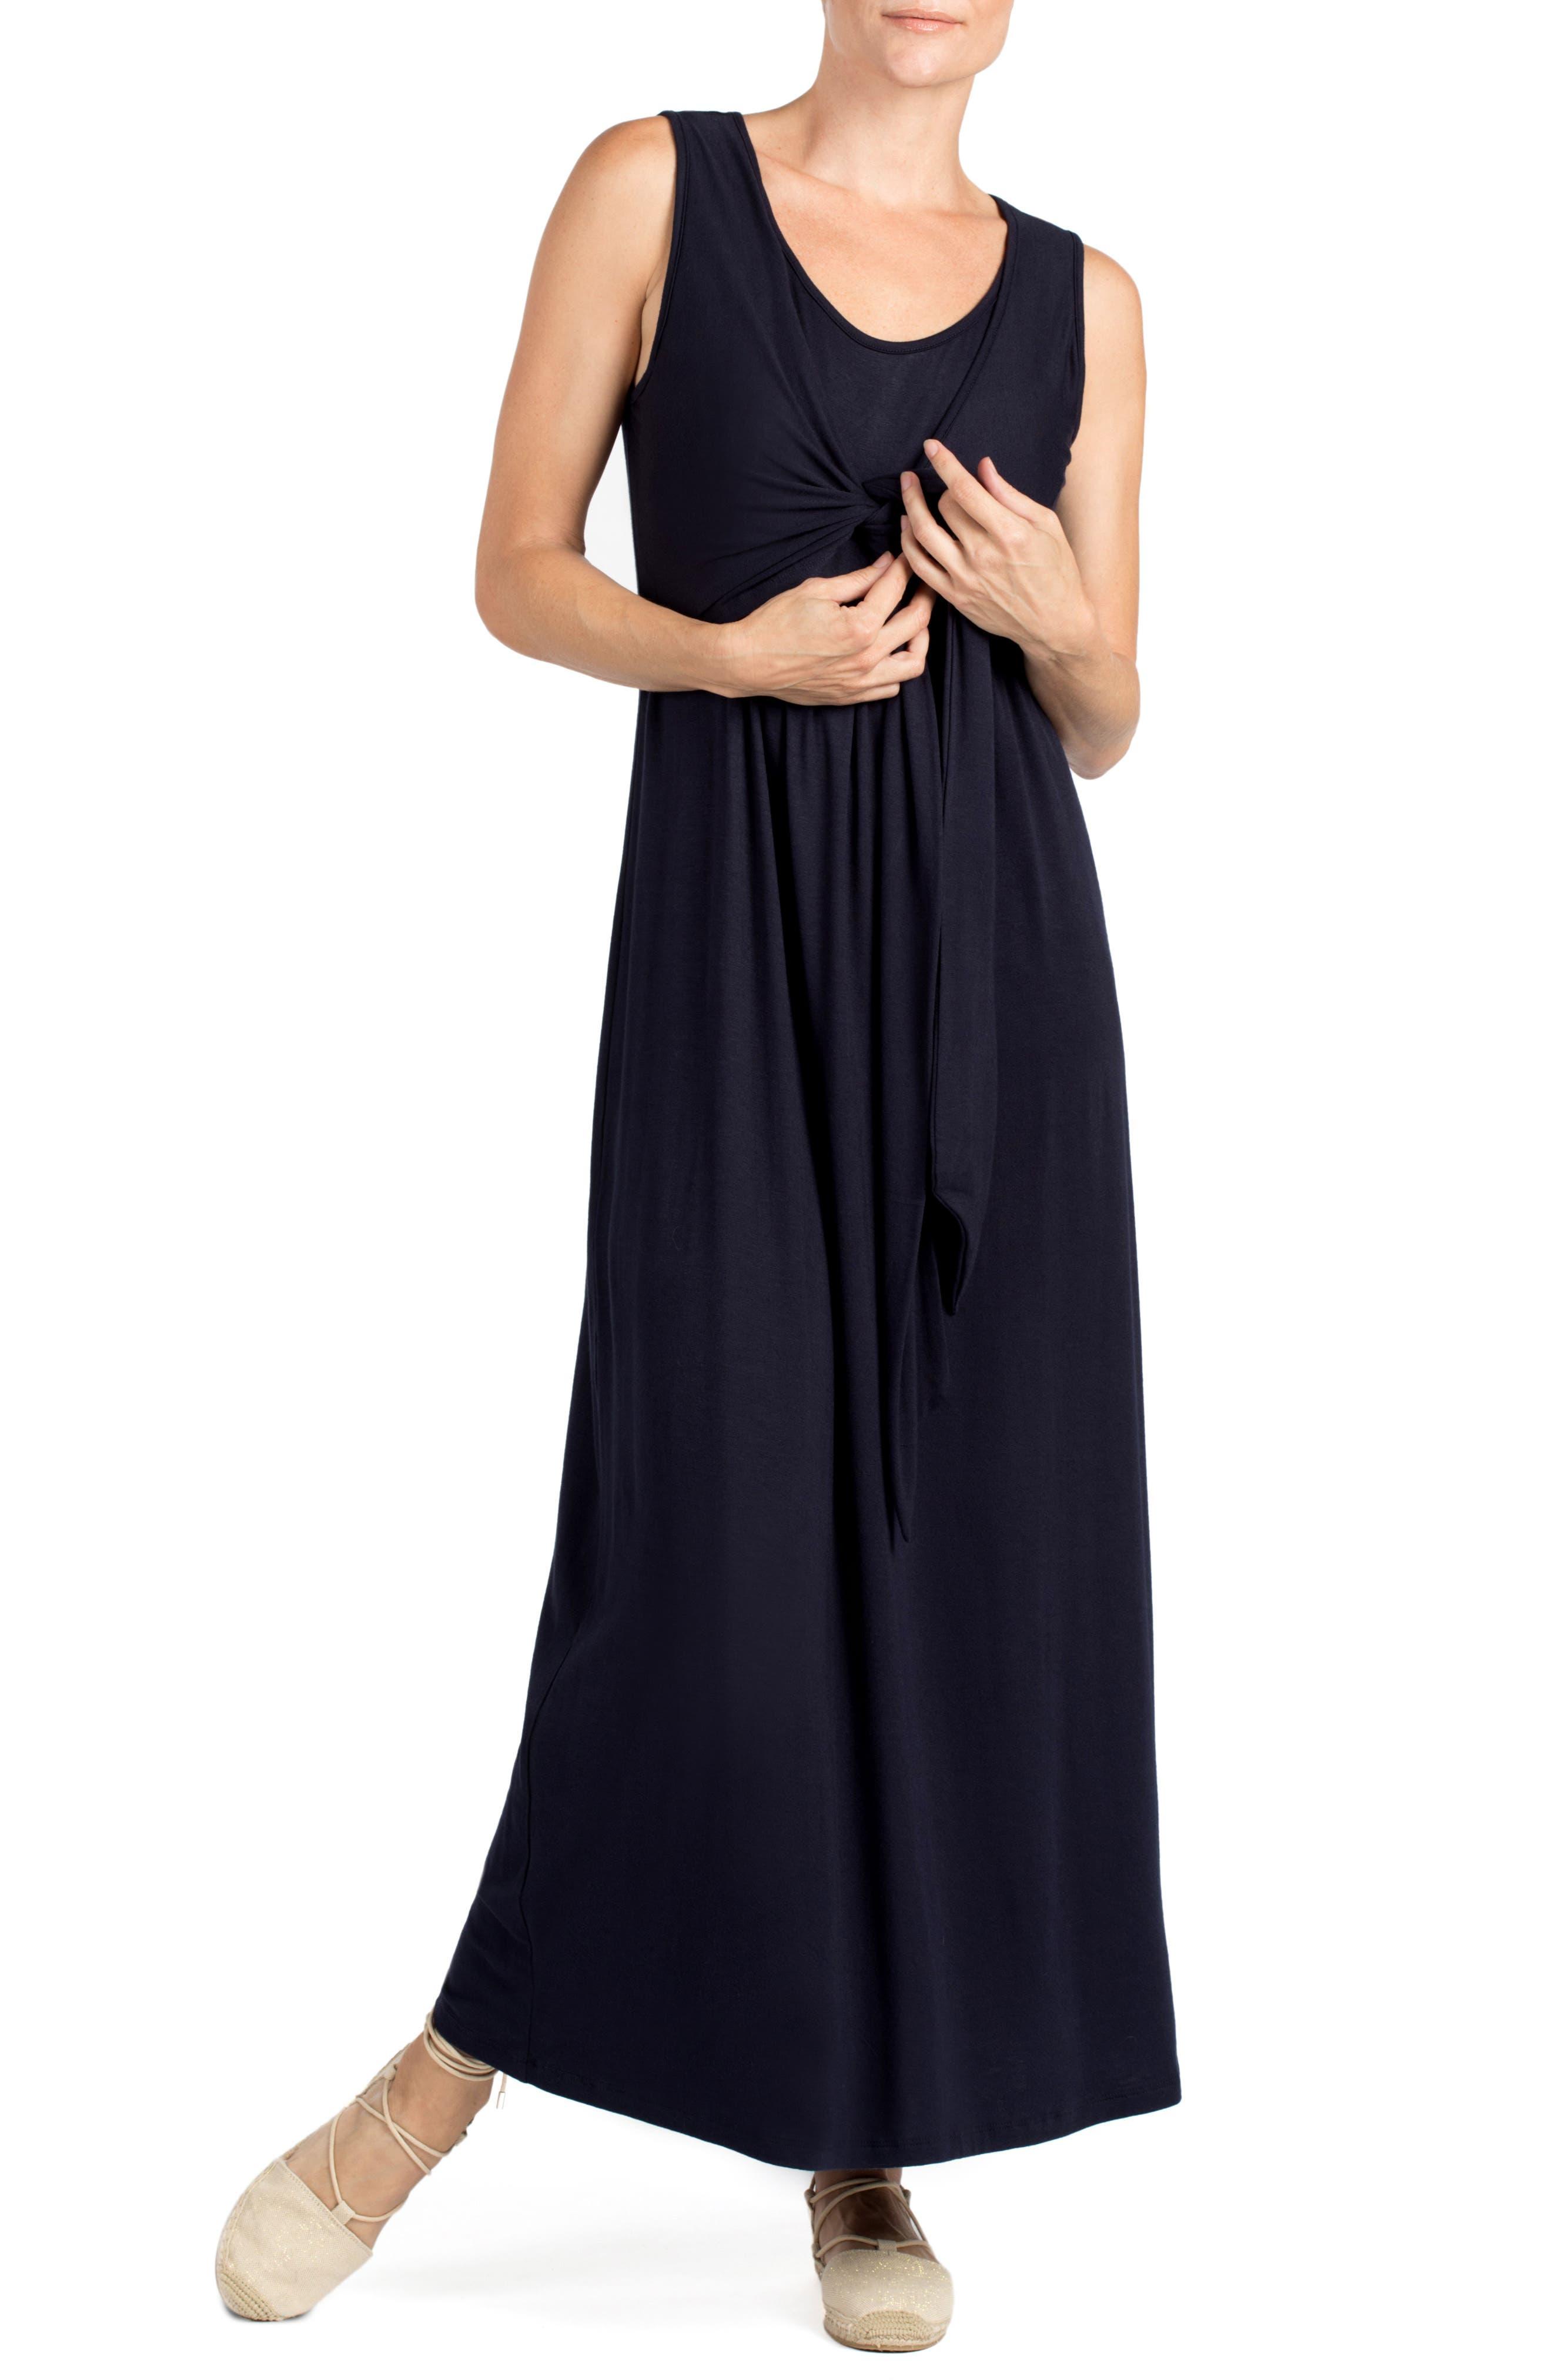 Modesto Maternity/Nursing Maxi Dress,                             Alternate thumbnail 3, color,                             NAVY